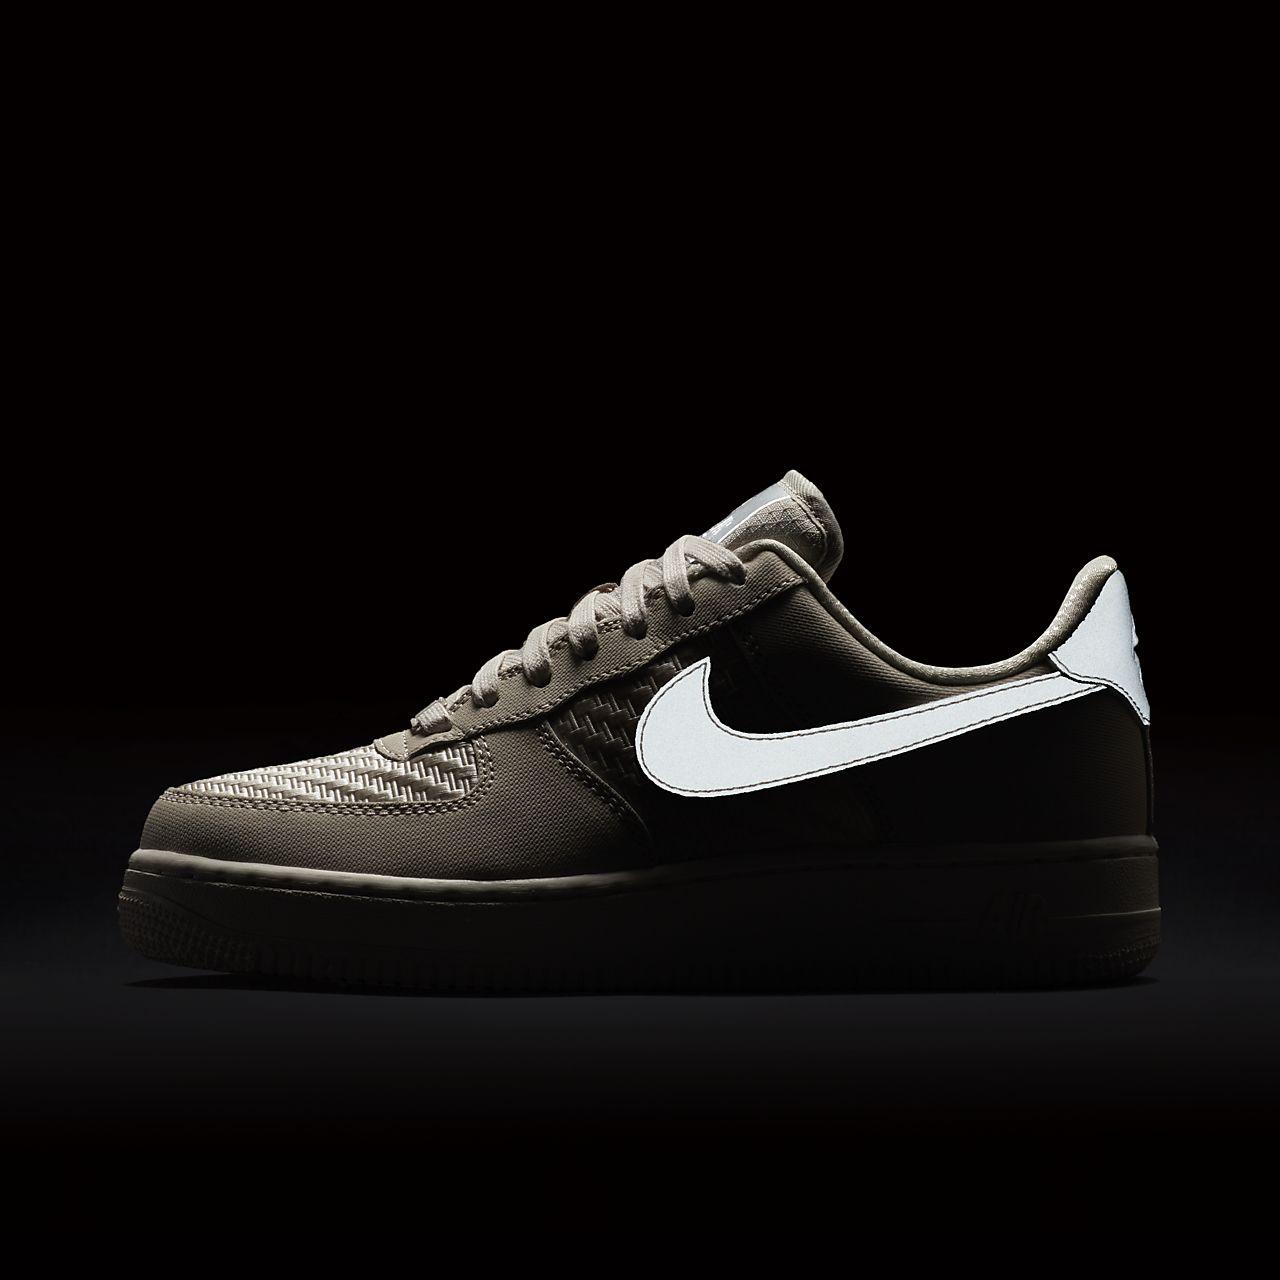 new styles 40b2b 8f7d0 ... Ivory Metallic Red Bronze Dark Stucco AA3968 ... Nike Air Force 1 07  Pinnacle Womens Shoe .